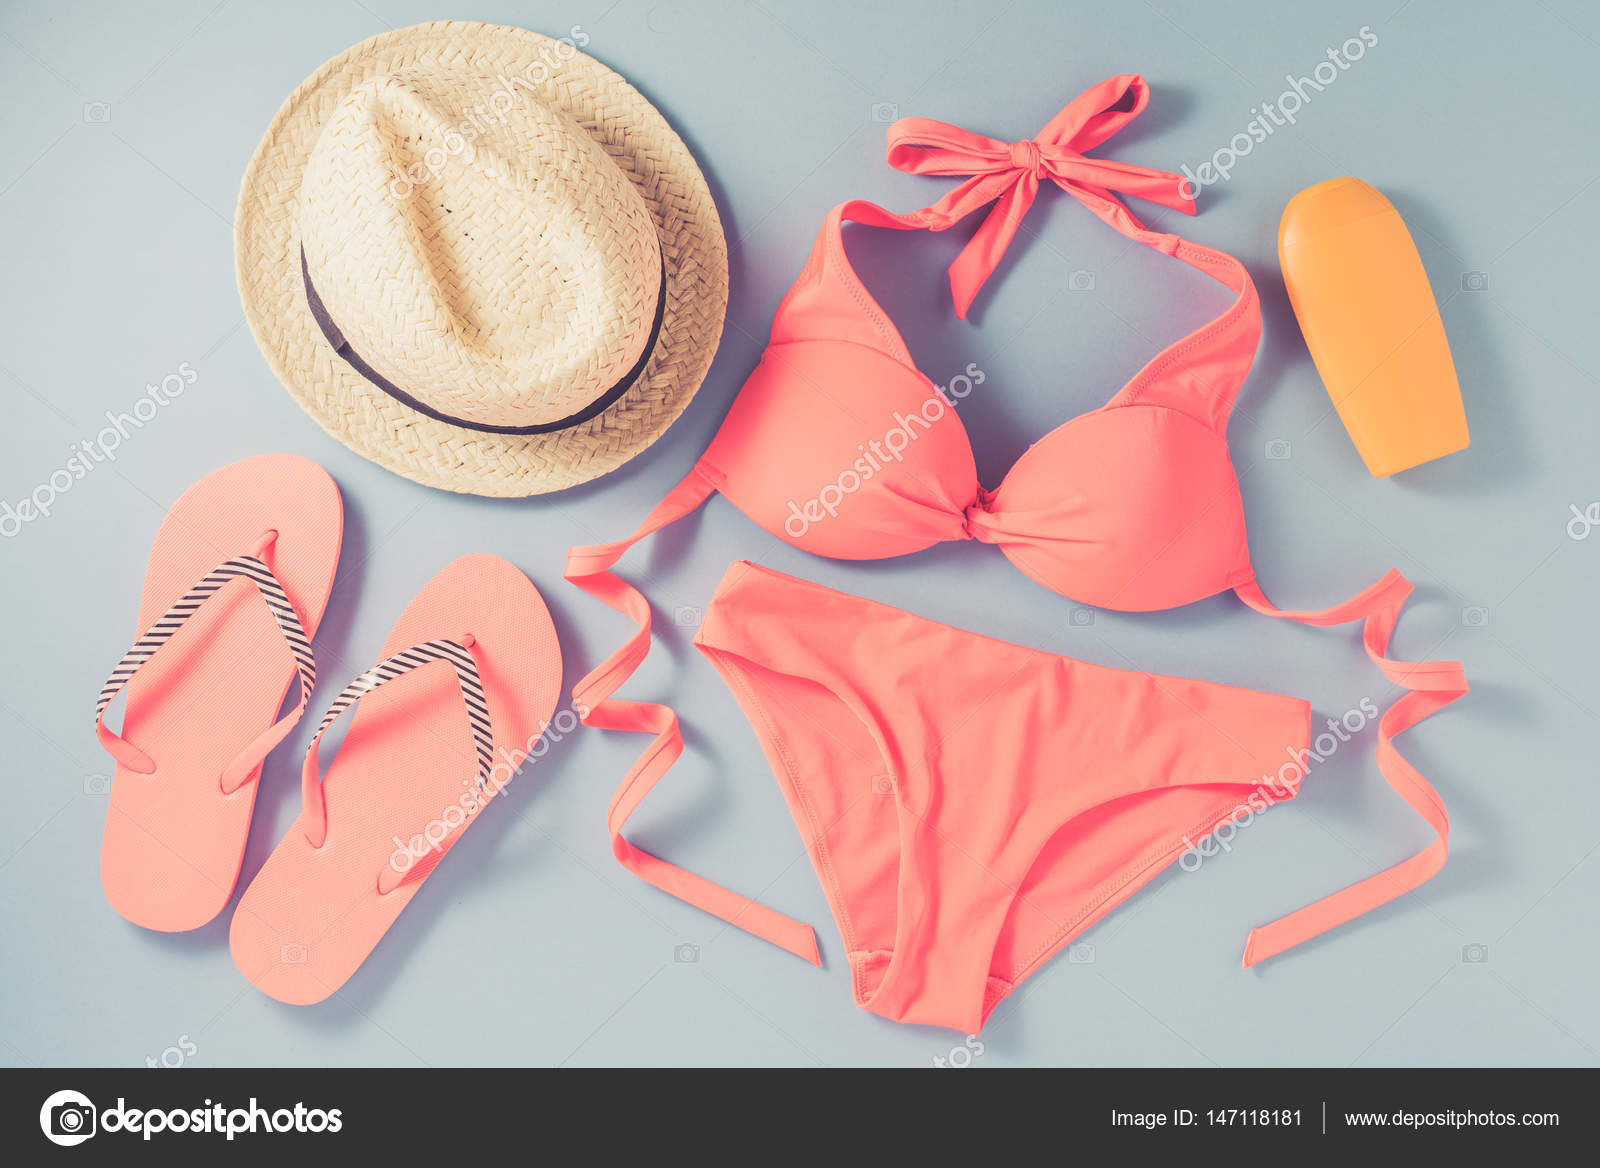 534391906b Ροζ μαγιό με αξεσουάρ παραλίας σε μπλε φόντο — Φωτογραφία Αρχείου ...